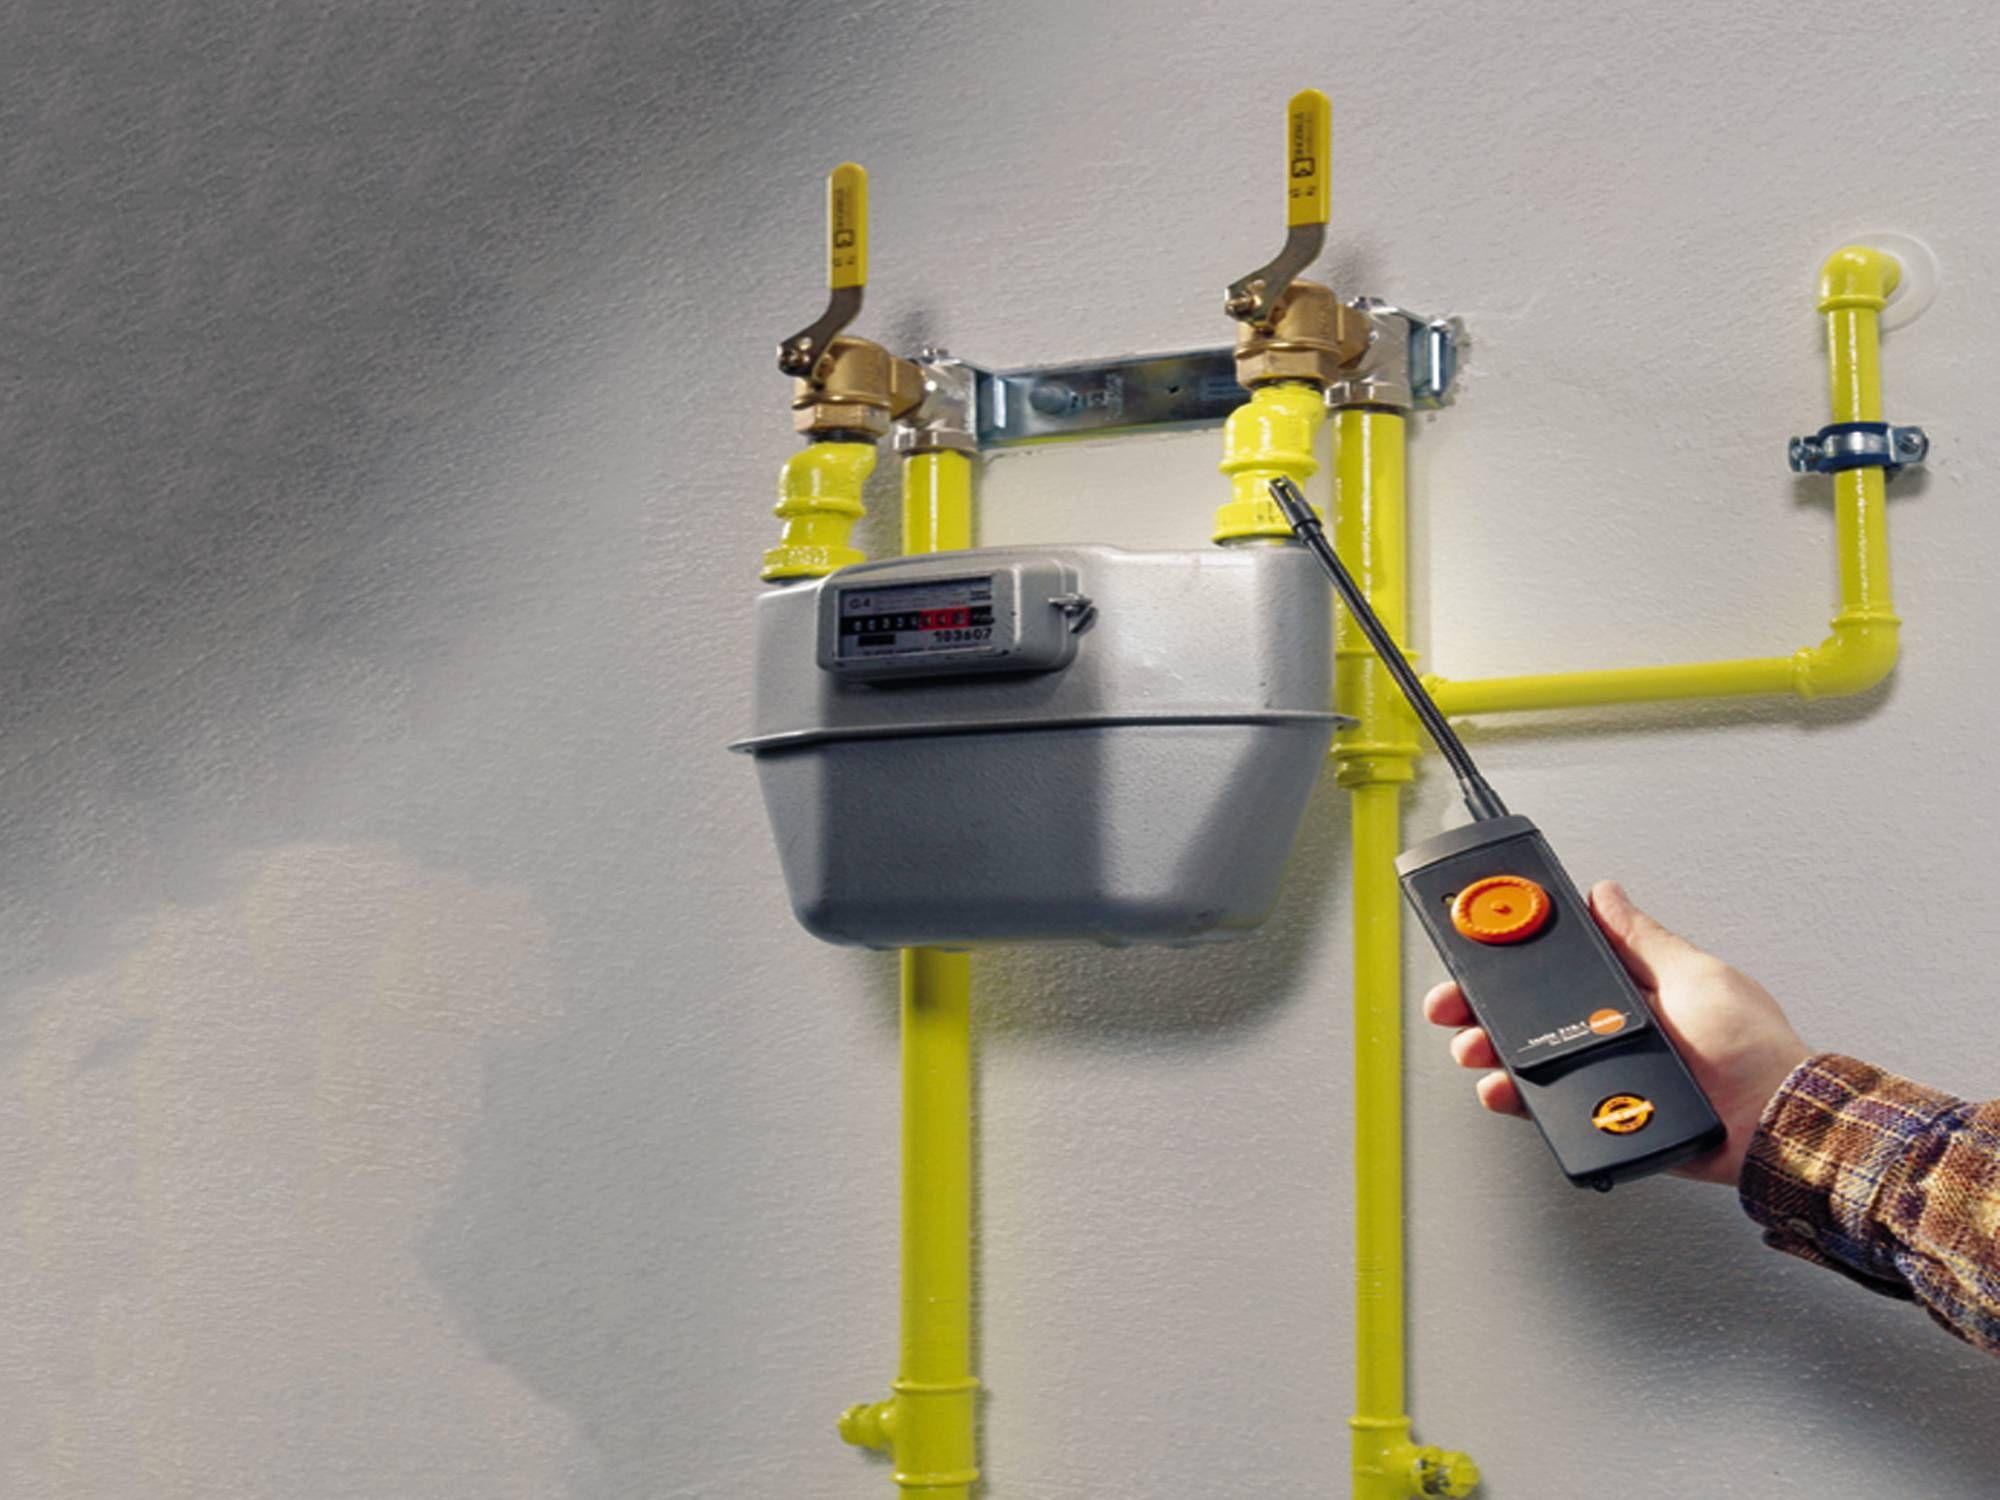 testo-316-1-leak-detector-application-uk.jpg